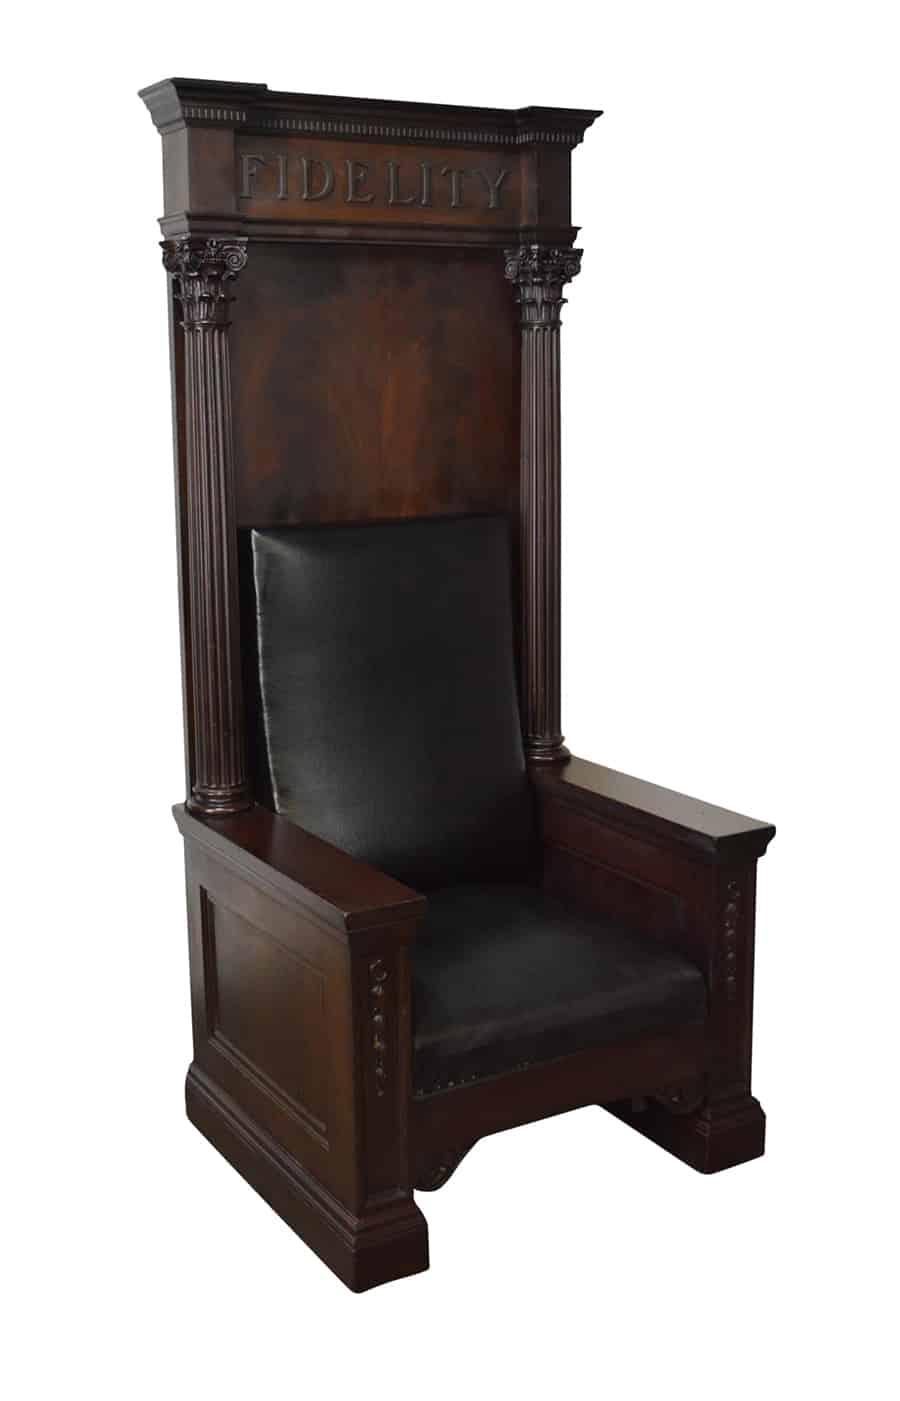 masonic throne chair 98765trfghj